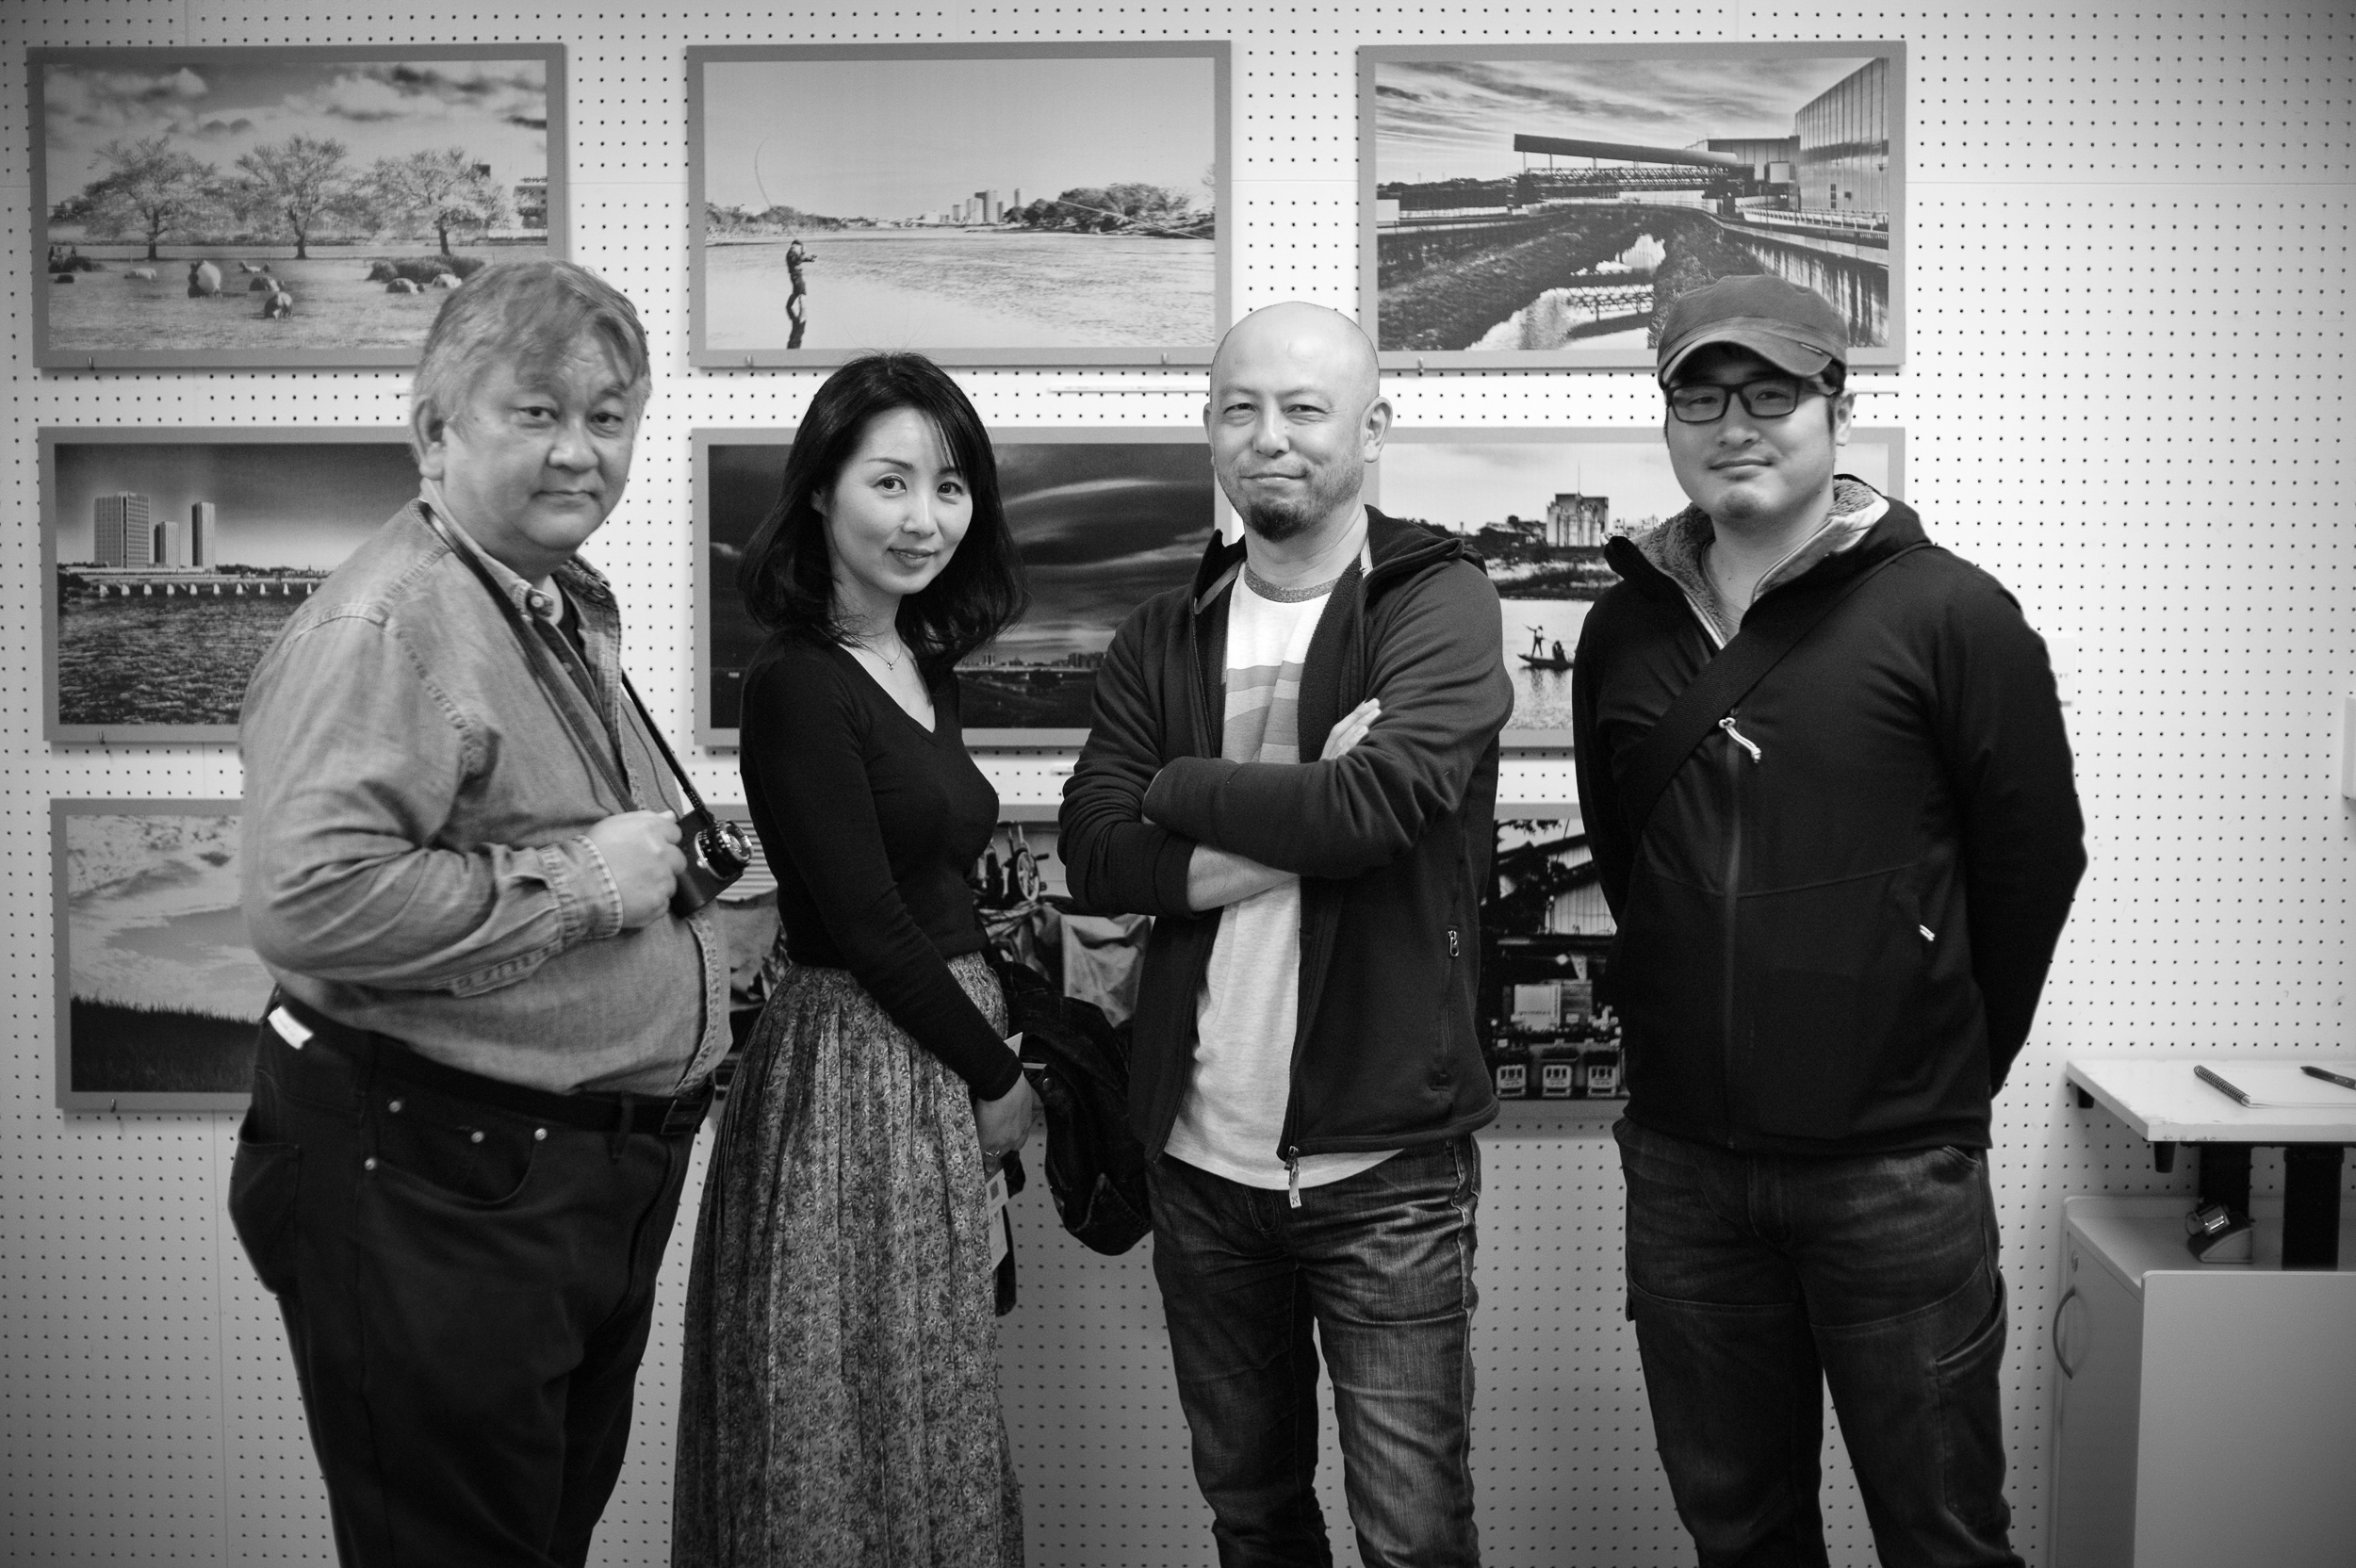 Group shot at Koichi Mitsui's photo exhibition at Setagaya Art Museum / Taiji Kiyokawa Memorial Gallery